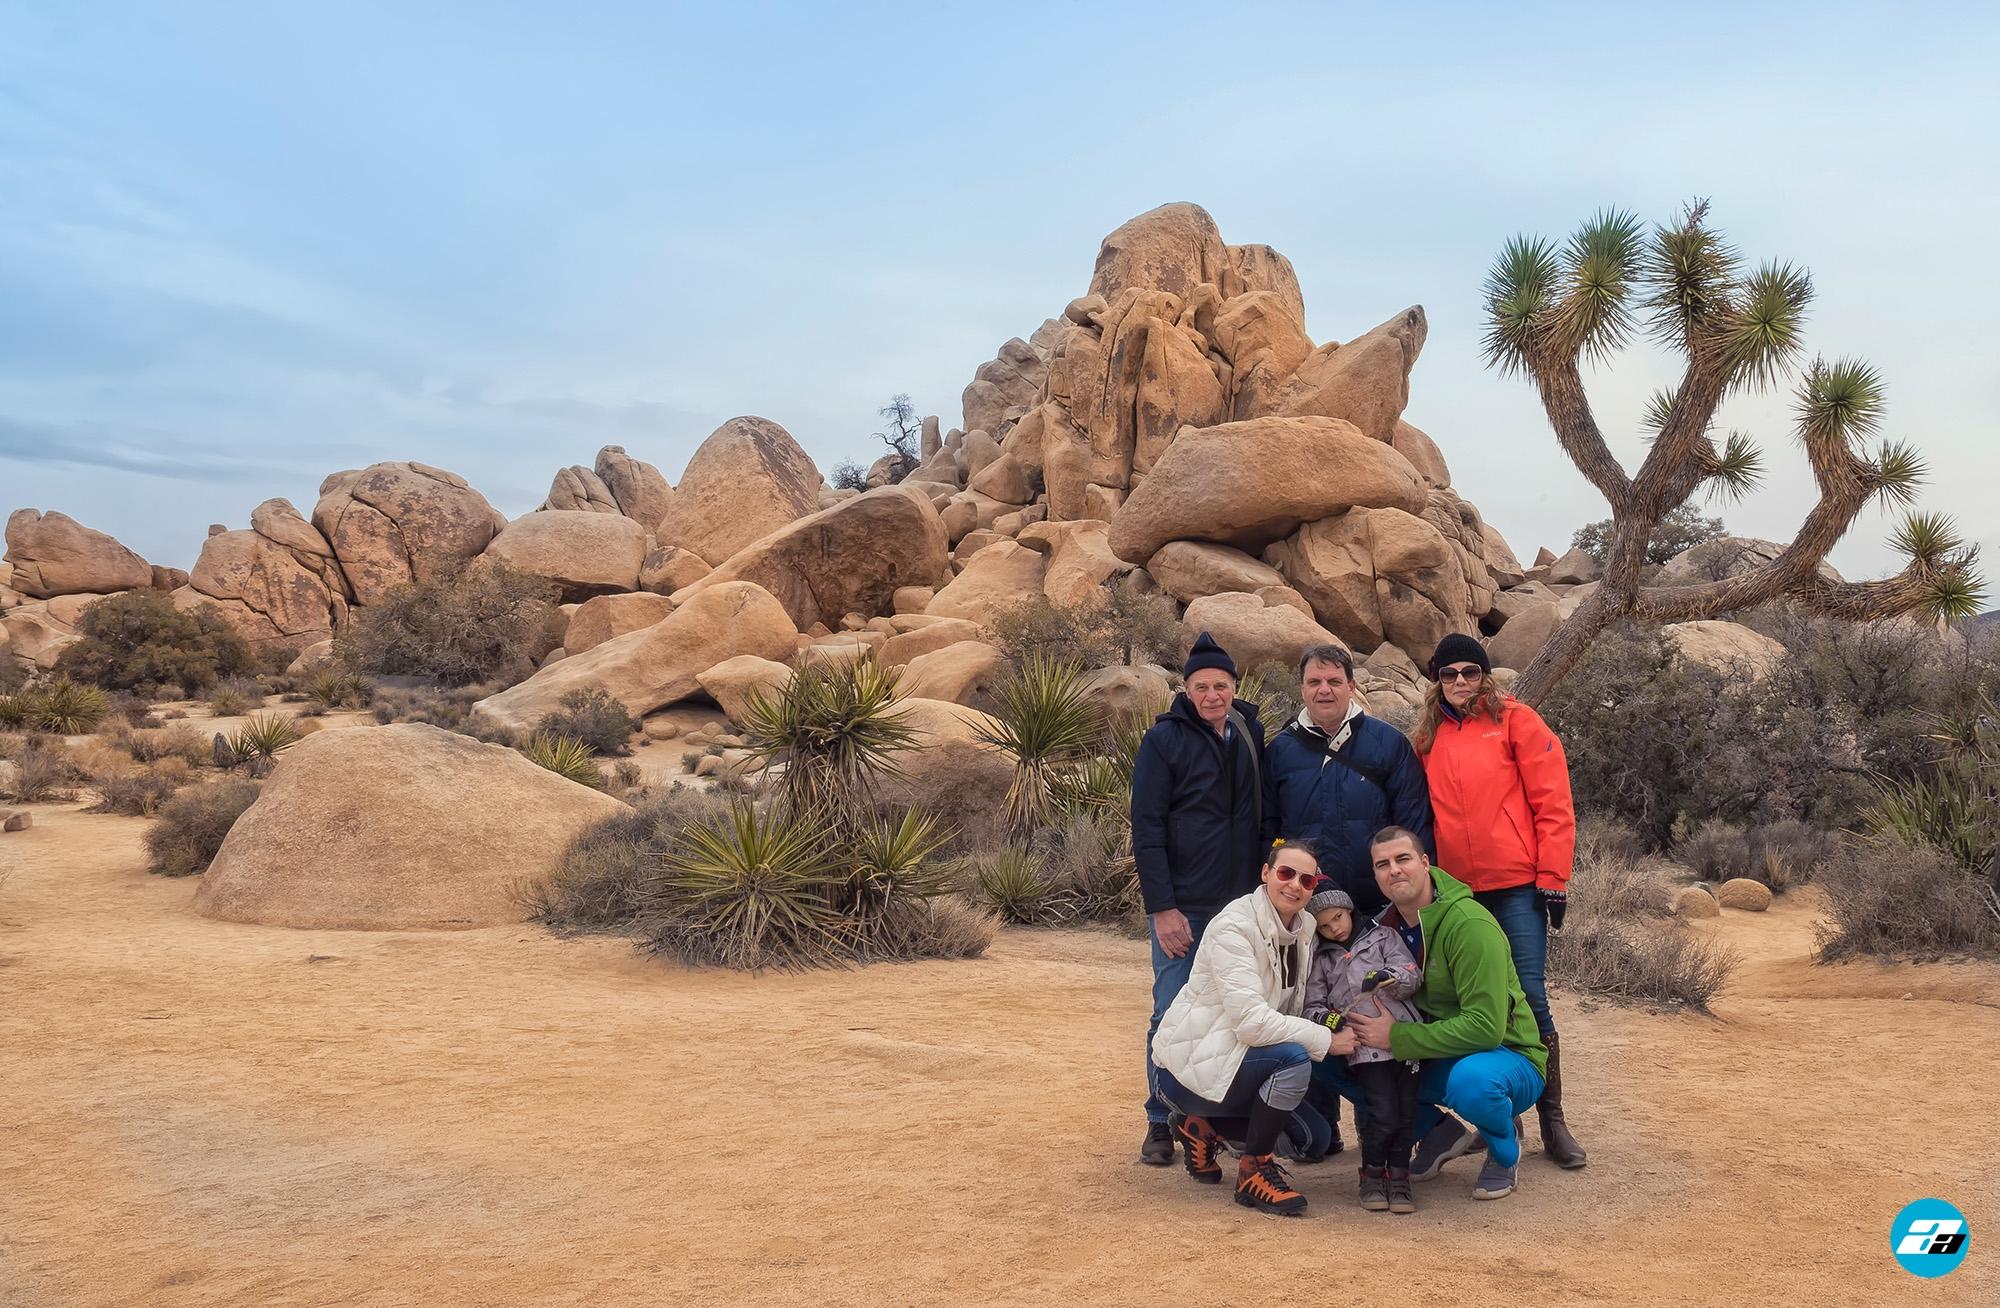 California, USA. California Attraction & Travel. Family Photo.